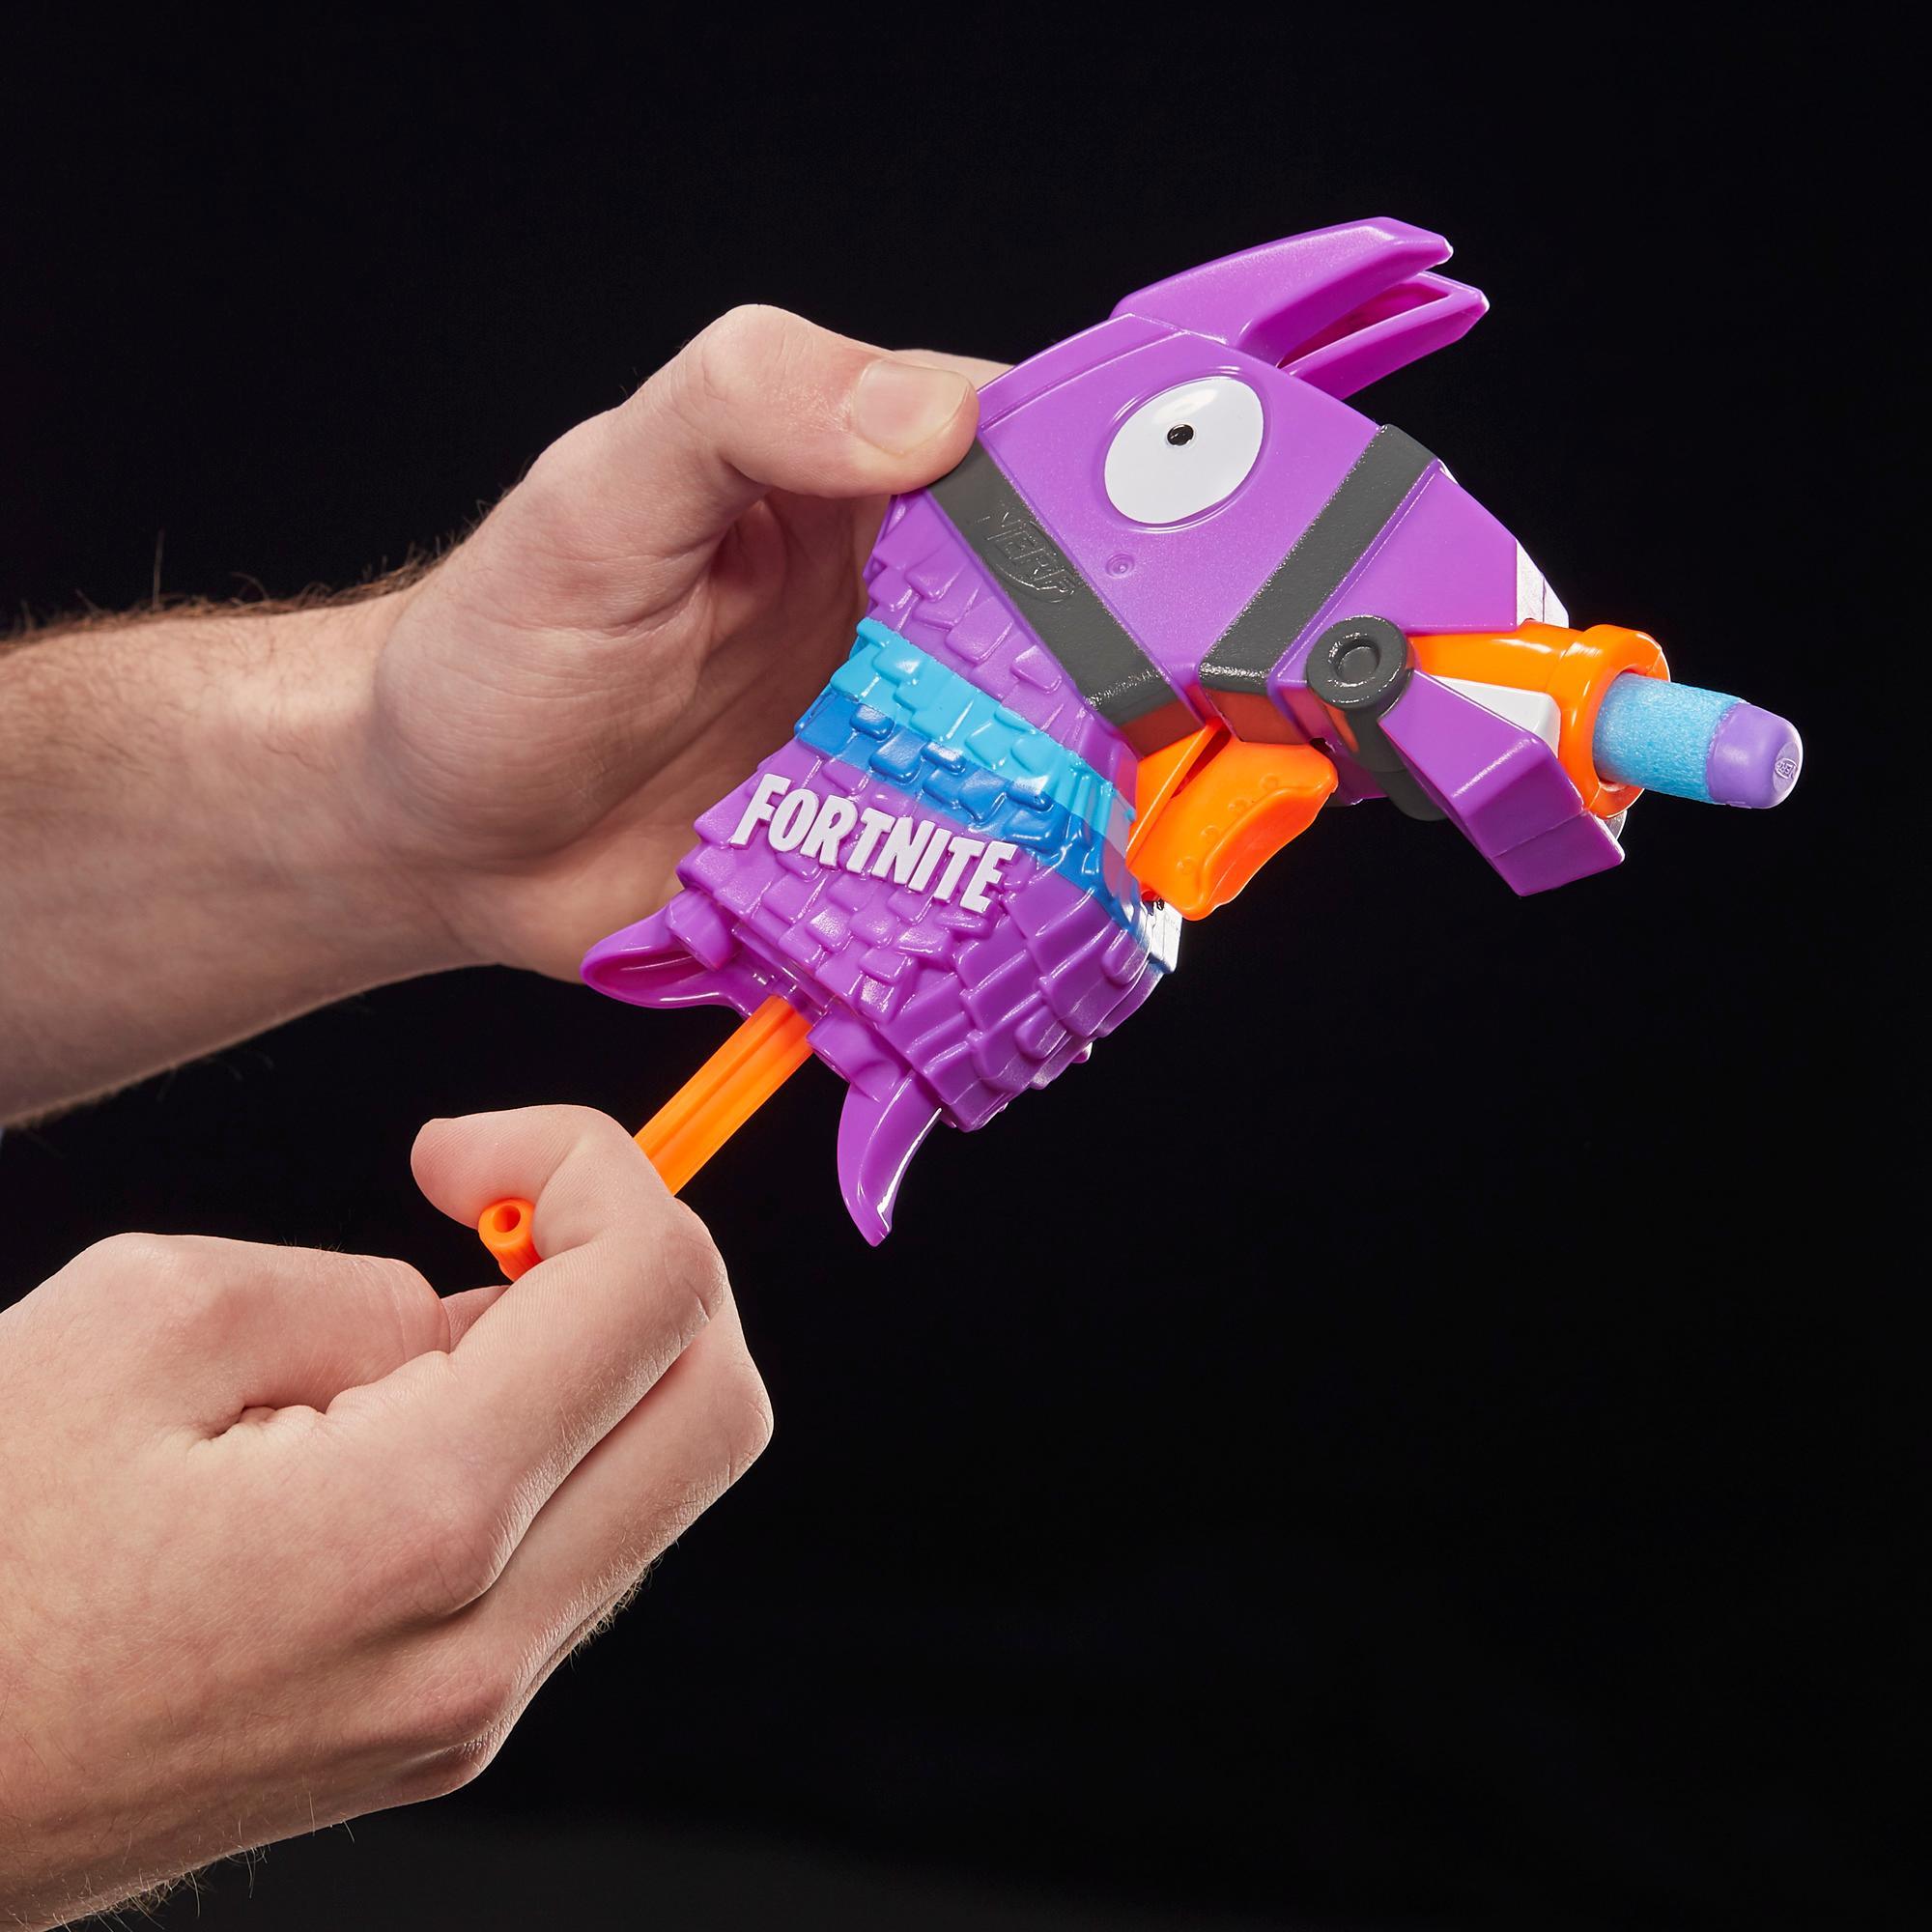 Fortnite Llama Nerf MicroShots Dart-Firing Toy Blaster